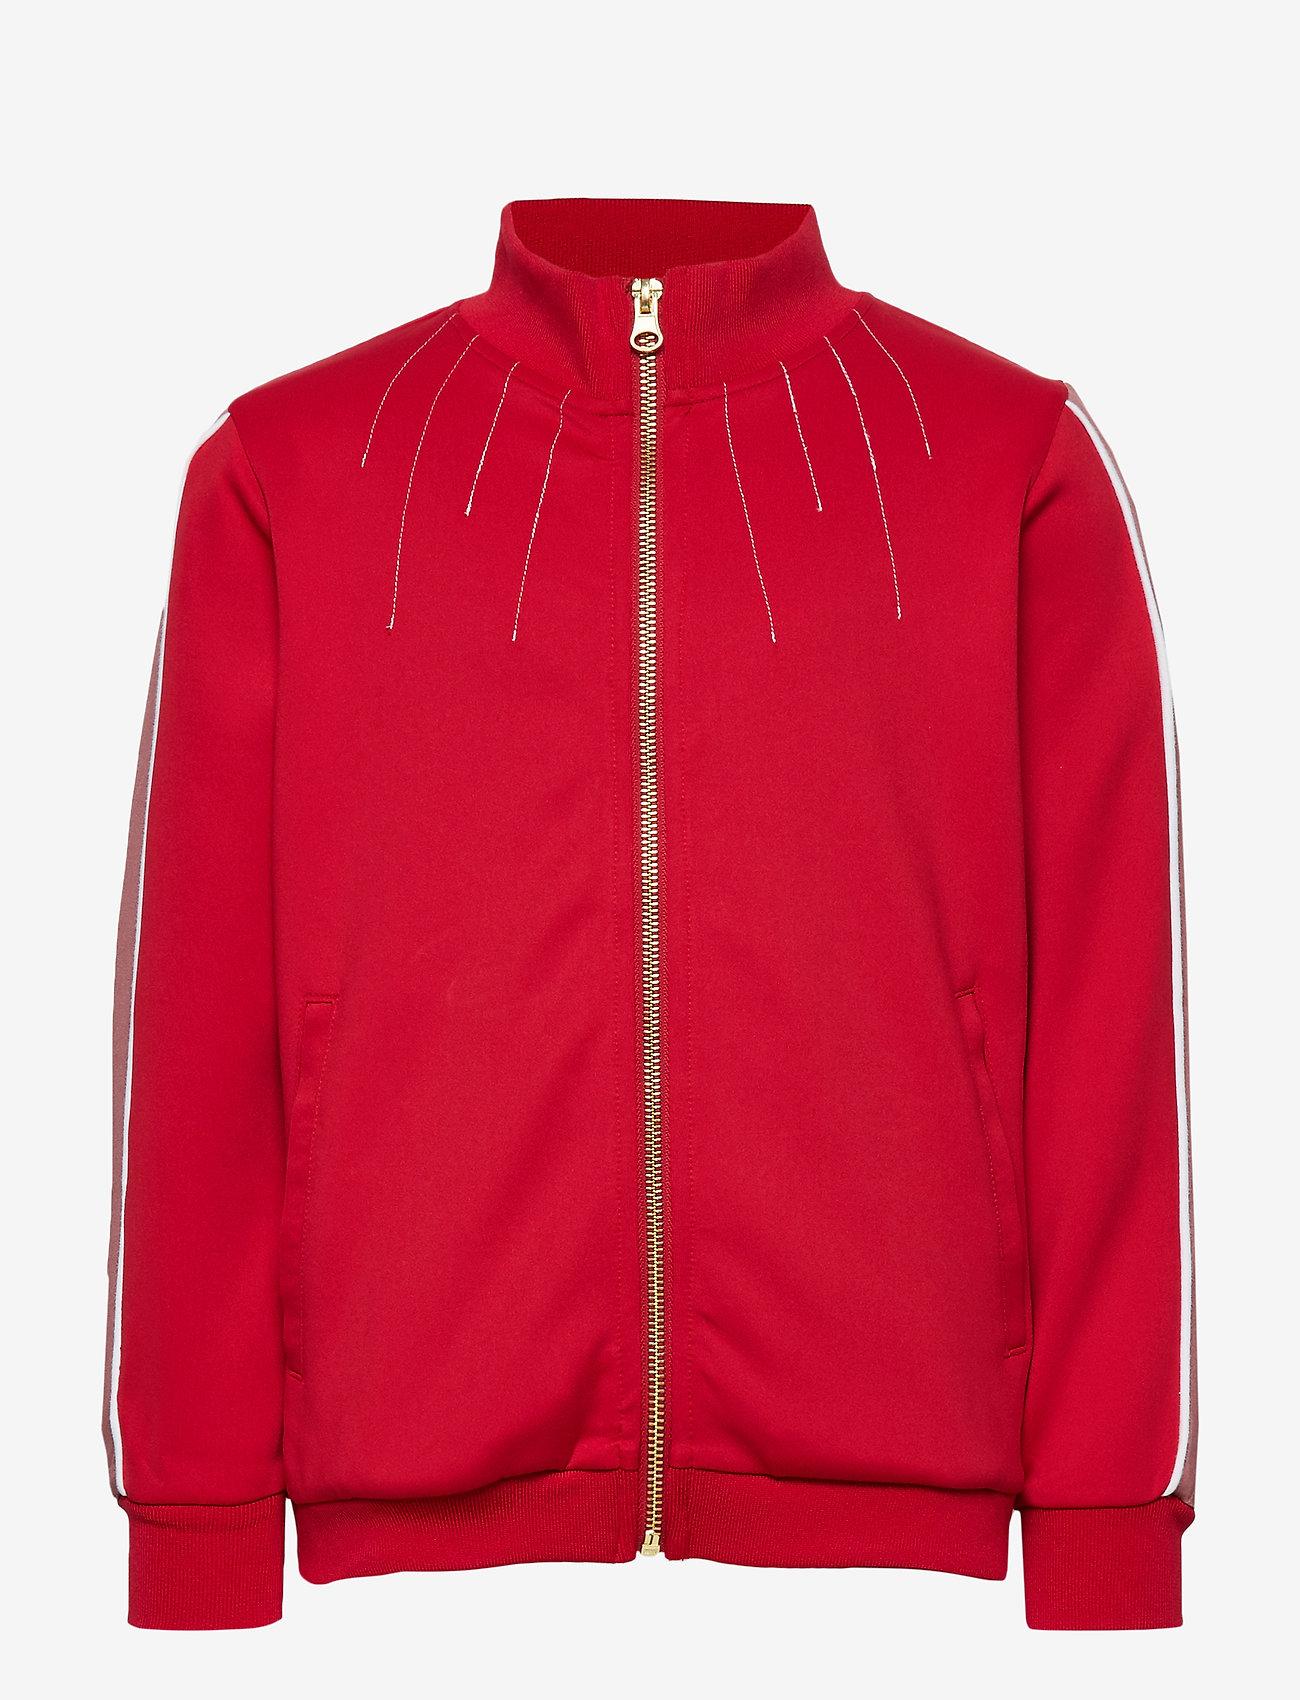 Petit by Sofie Schnoor - Sweat - sweatshirts - red - 0